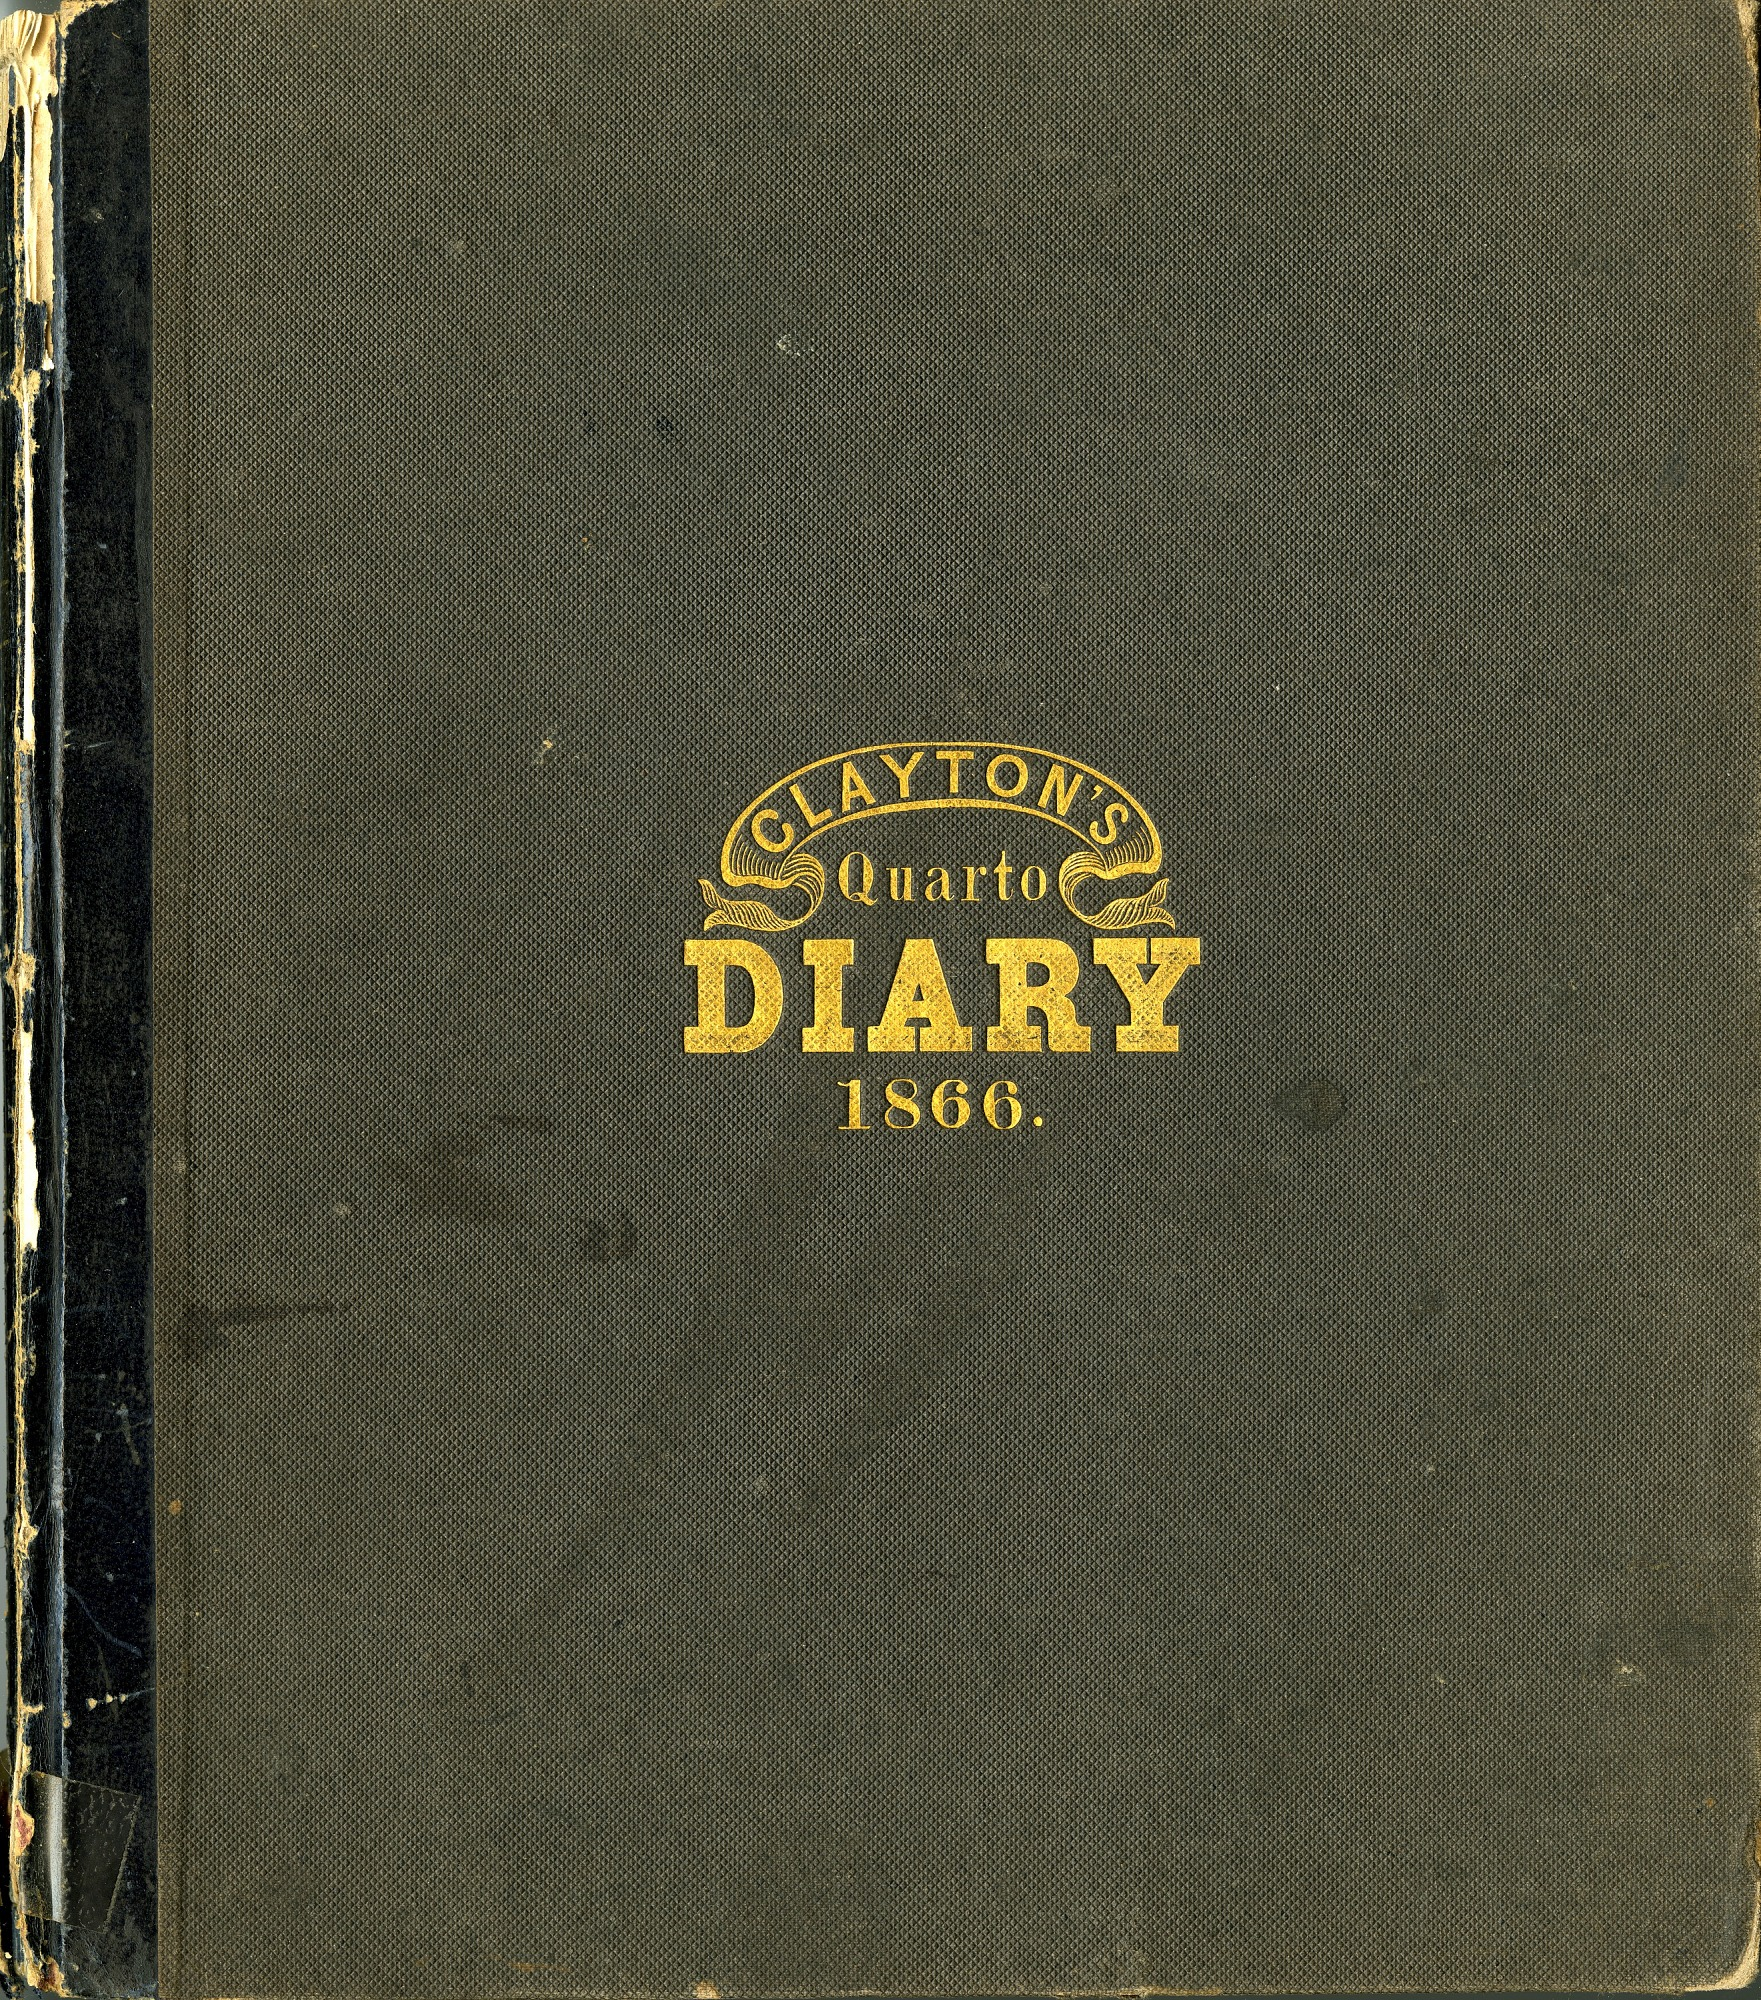 Excerpt from Joseph Henry's Desk Diary (October 10, 1866)